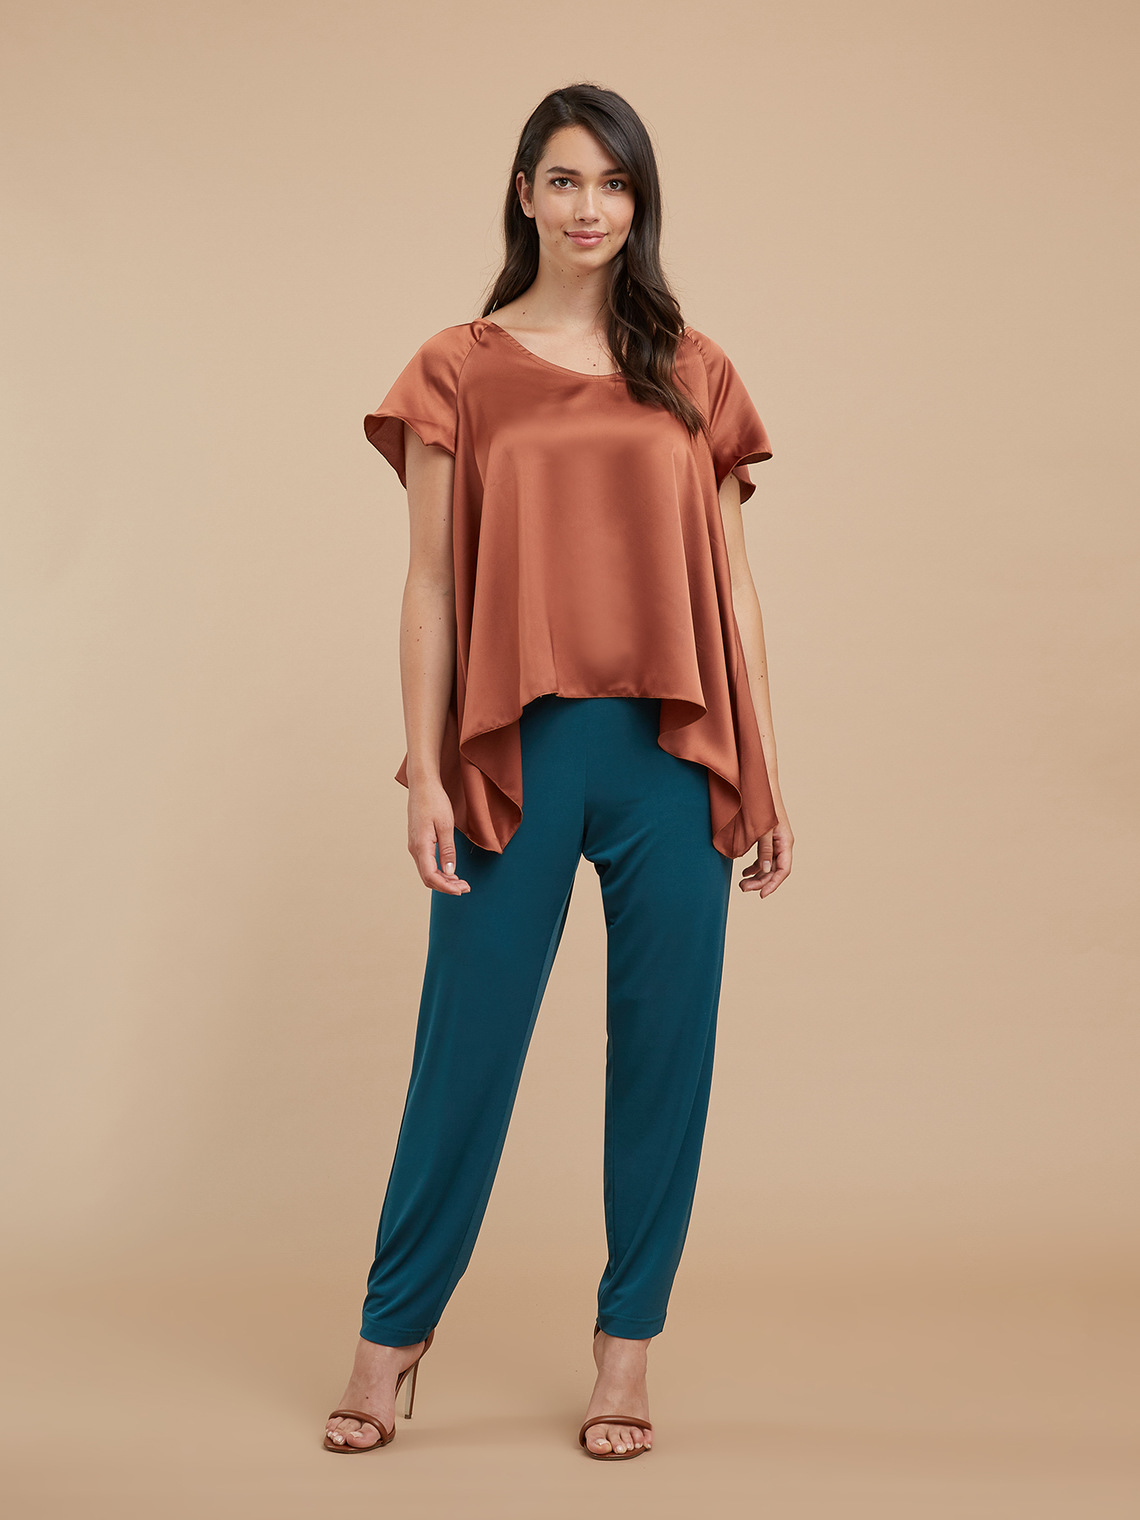 Fiorellarubino: Pantaloni ampi in jersey_1